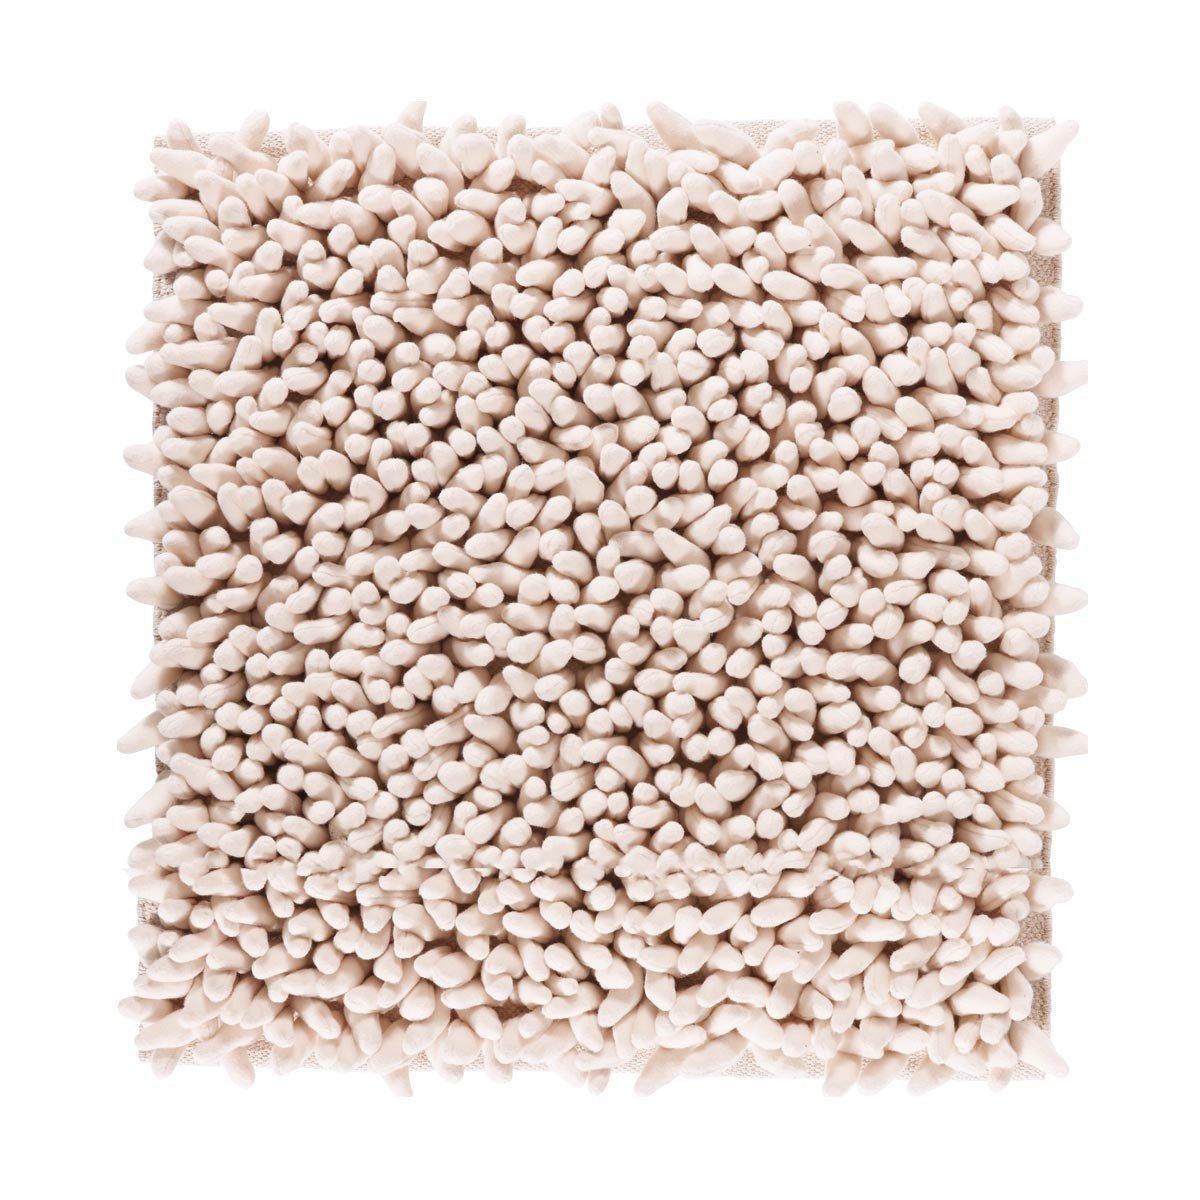 Badteppich Sorbet ZIZA Aquaonva Langfloorteppich 60x60, 60x100, 70x120, Größe 60x60